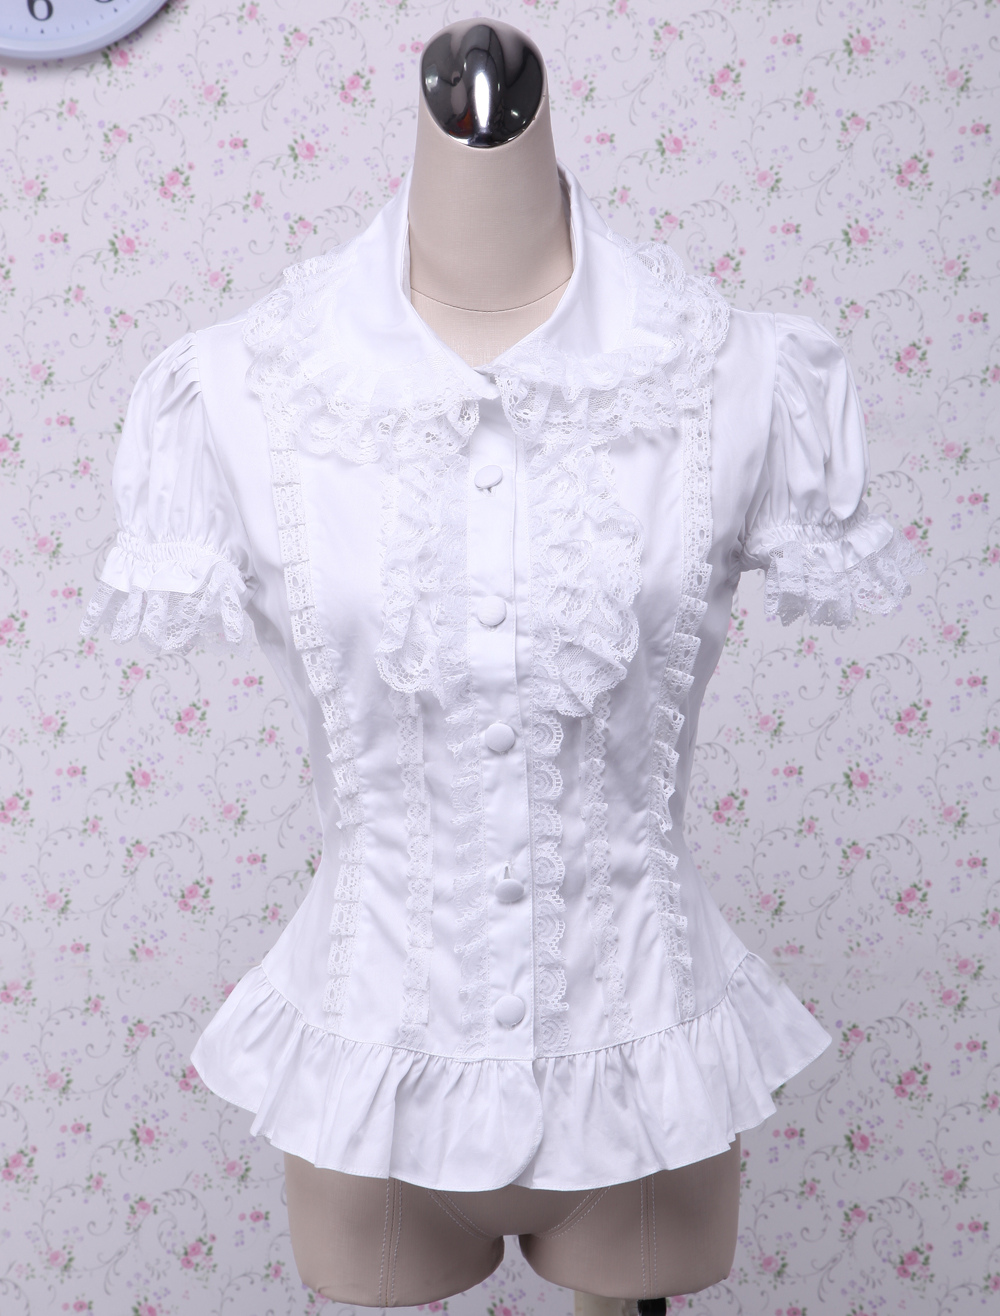 Sweet White Cotton Lolita Blouse Short Sleeves Layered Lace Trim Turn-down Collar